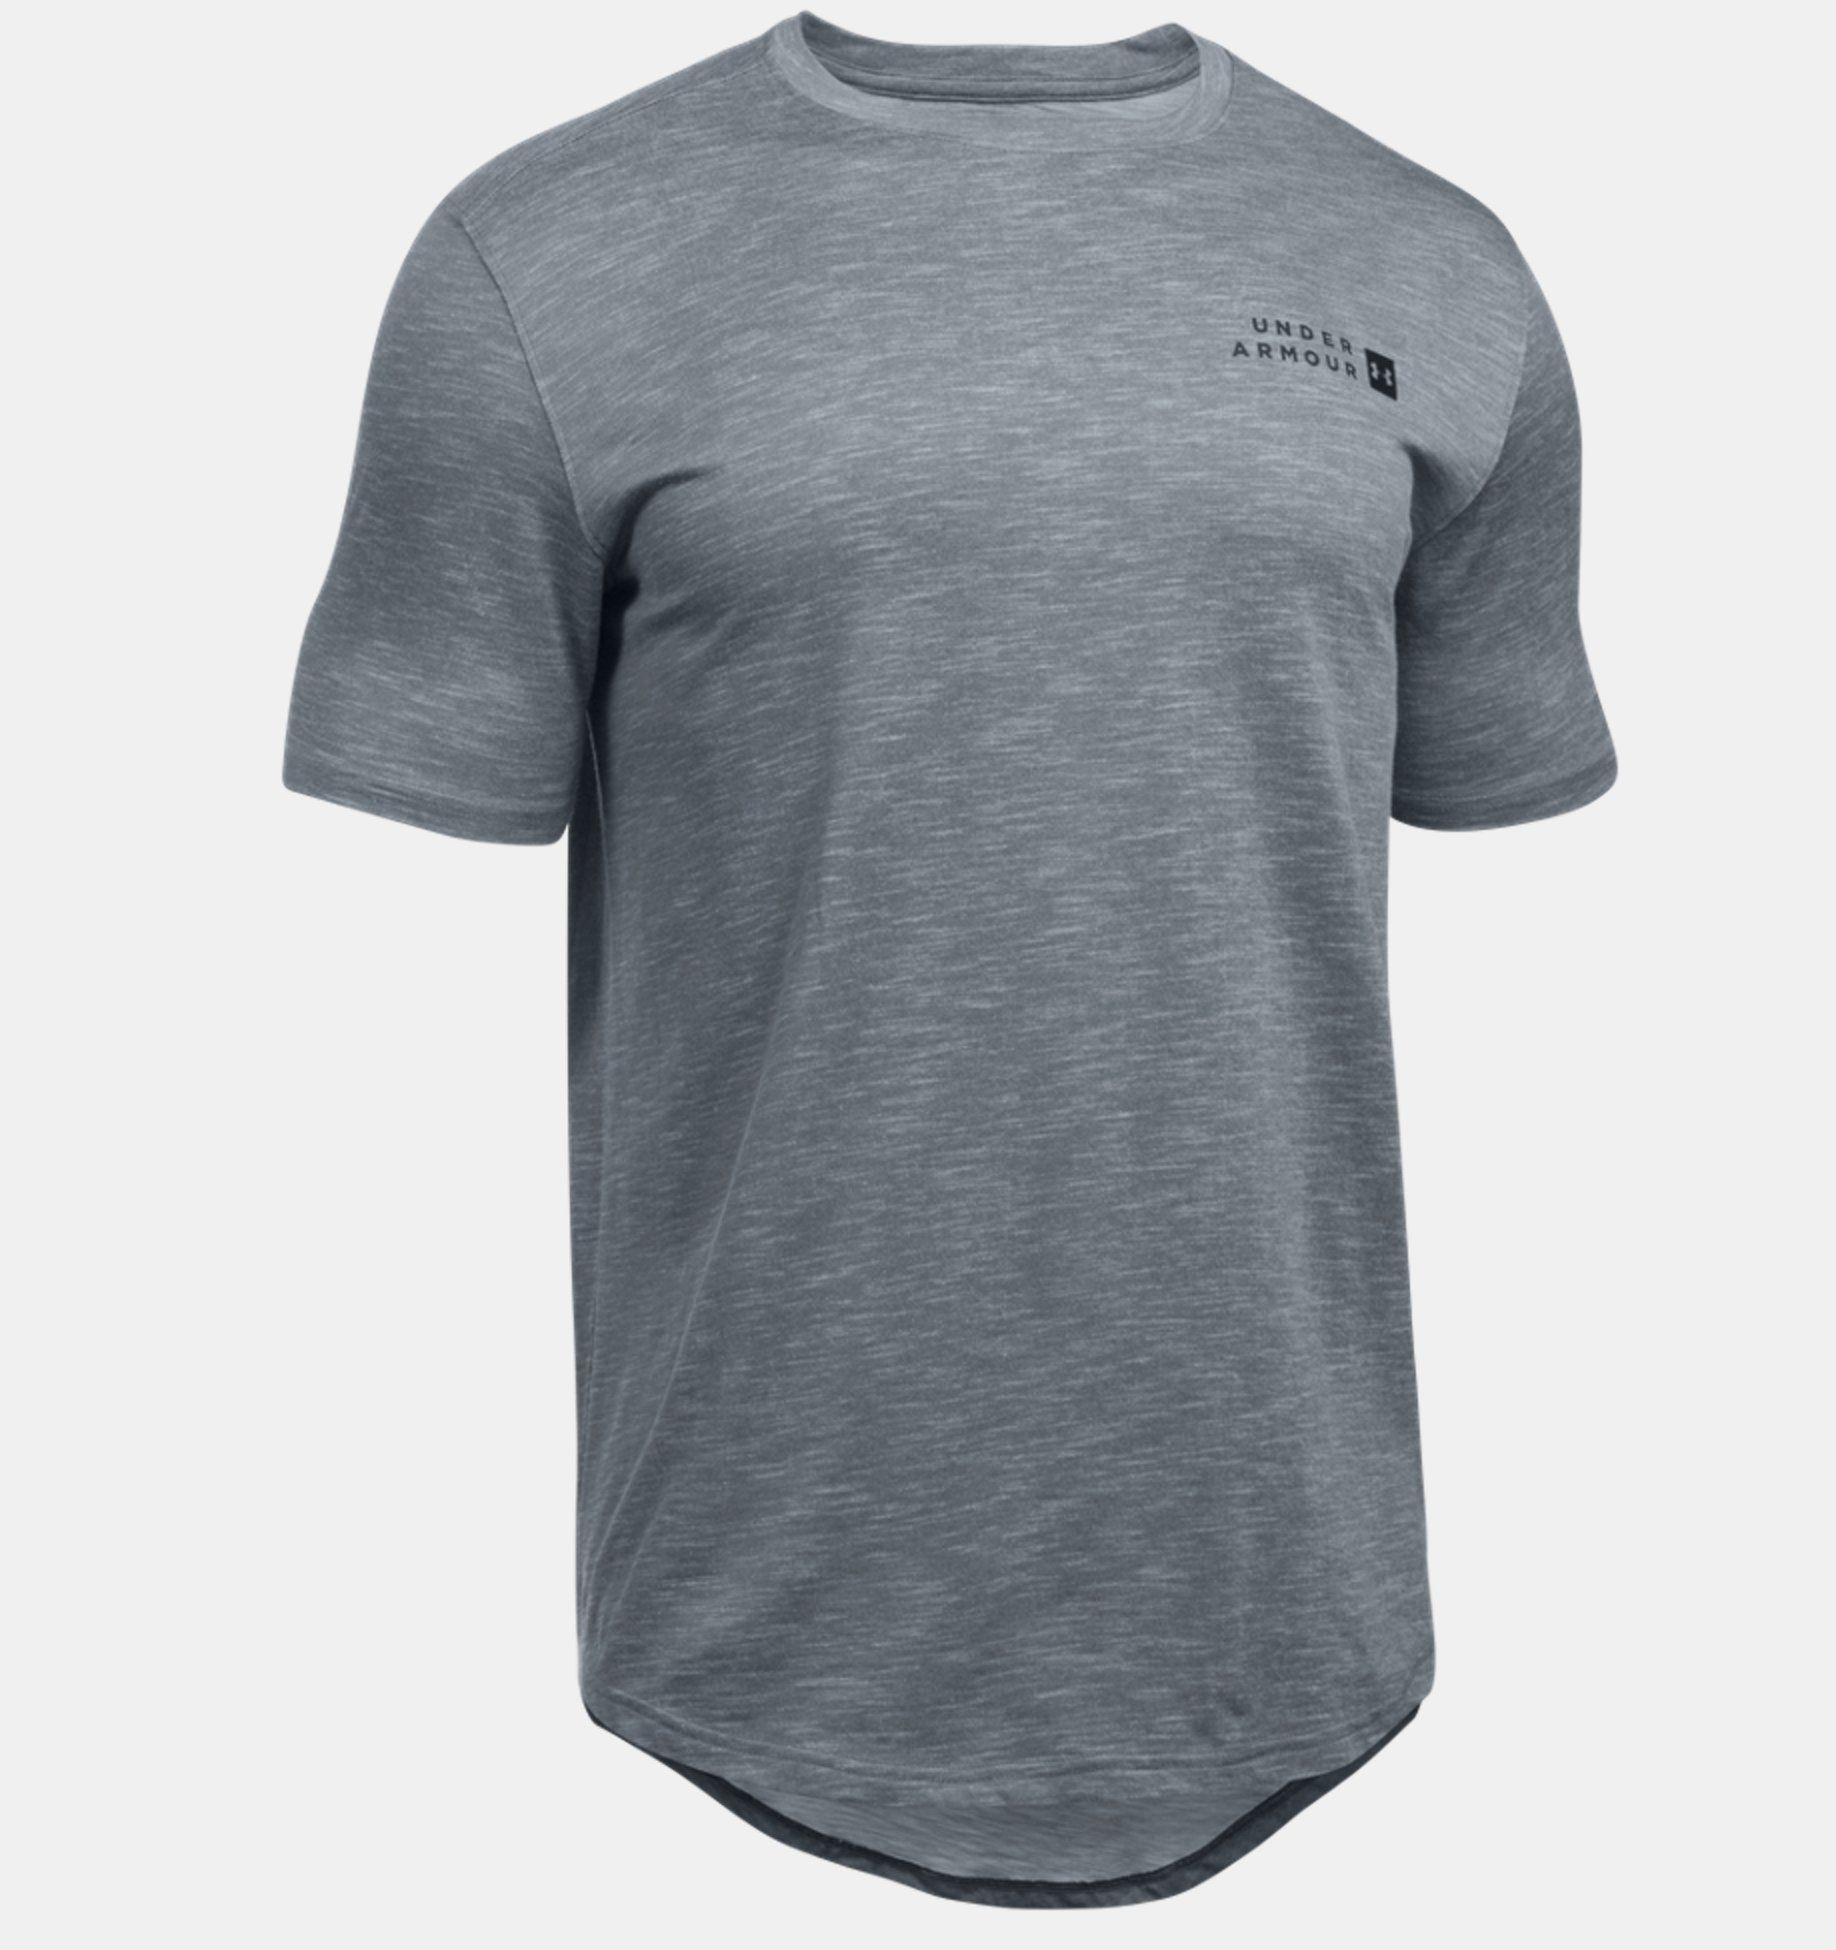 ce7b0c7a5dd Camiseta Masculina Under Armour Sportstyle - BRACIA SHOP  Loja de ...